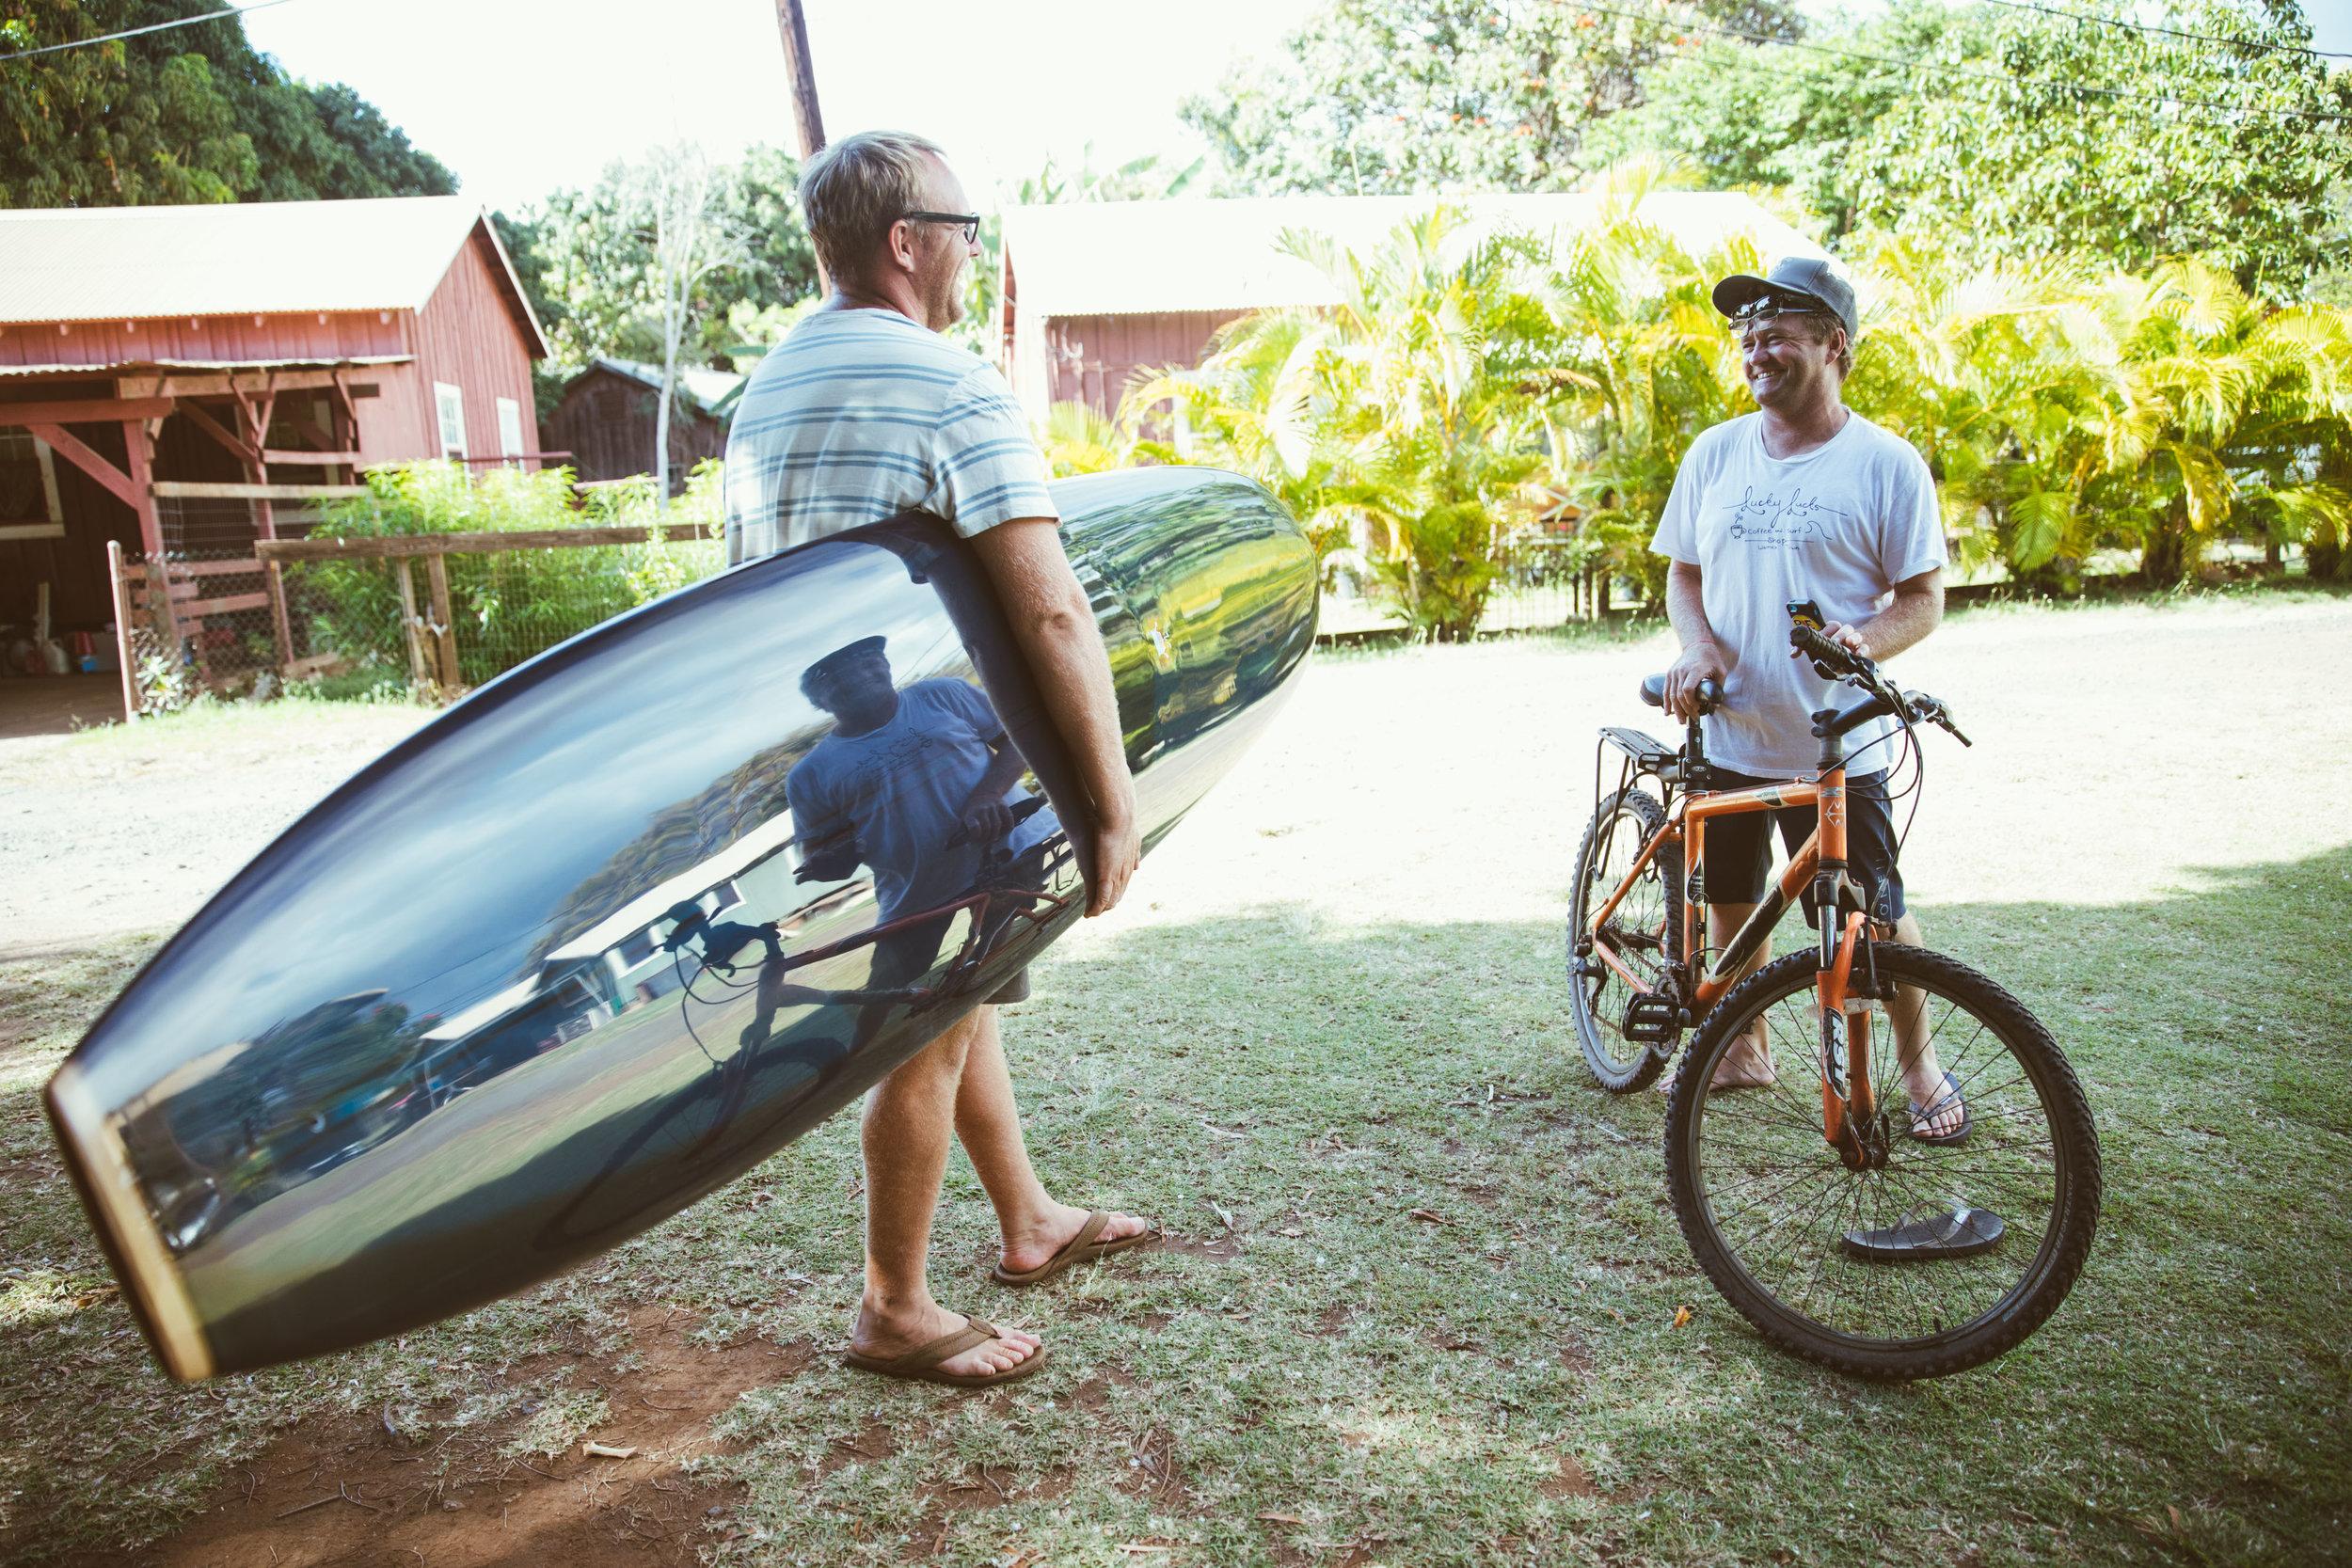 bryce johnson-photography-ebert surfboards-kauai-37.jpg